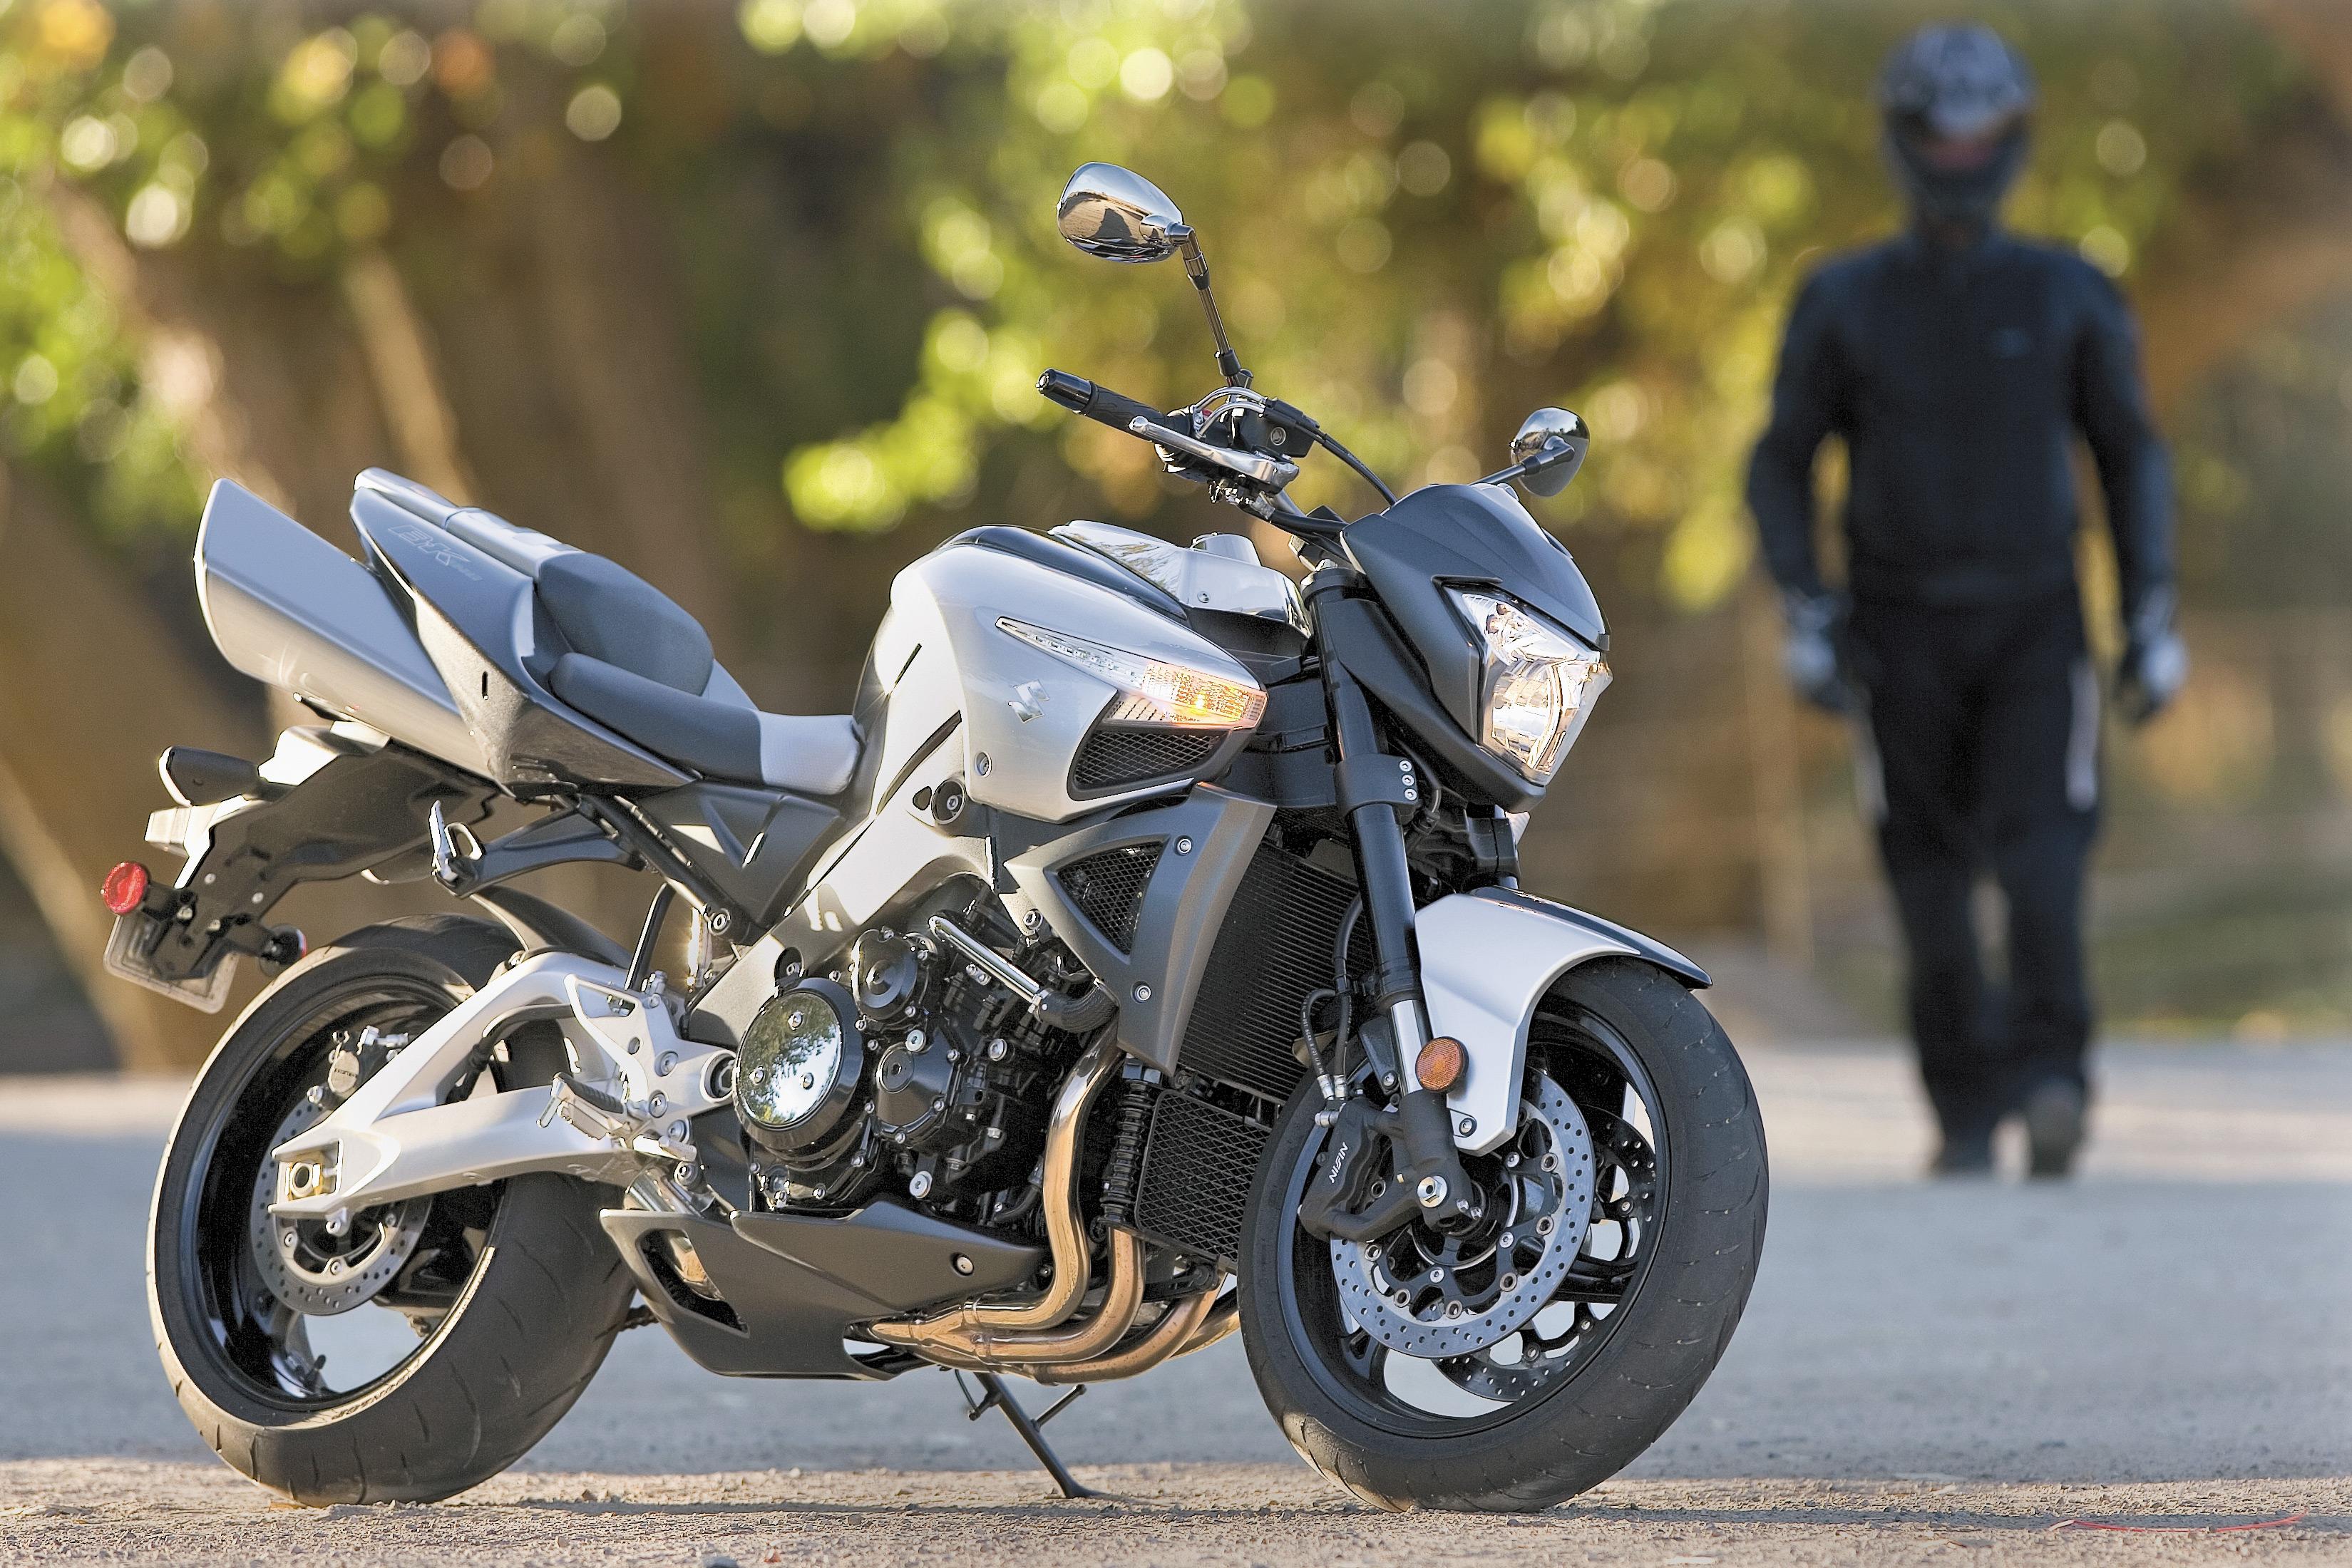 Suzuki B-King Naked Bike Motorcycle Review | Cycle World